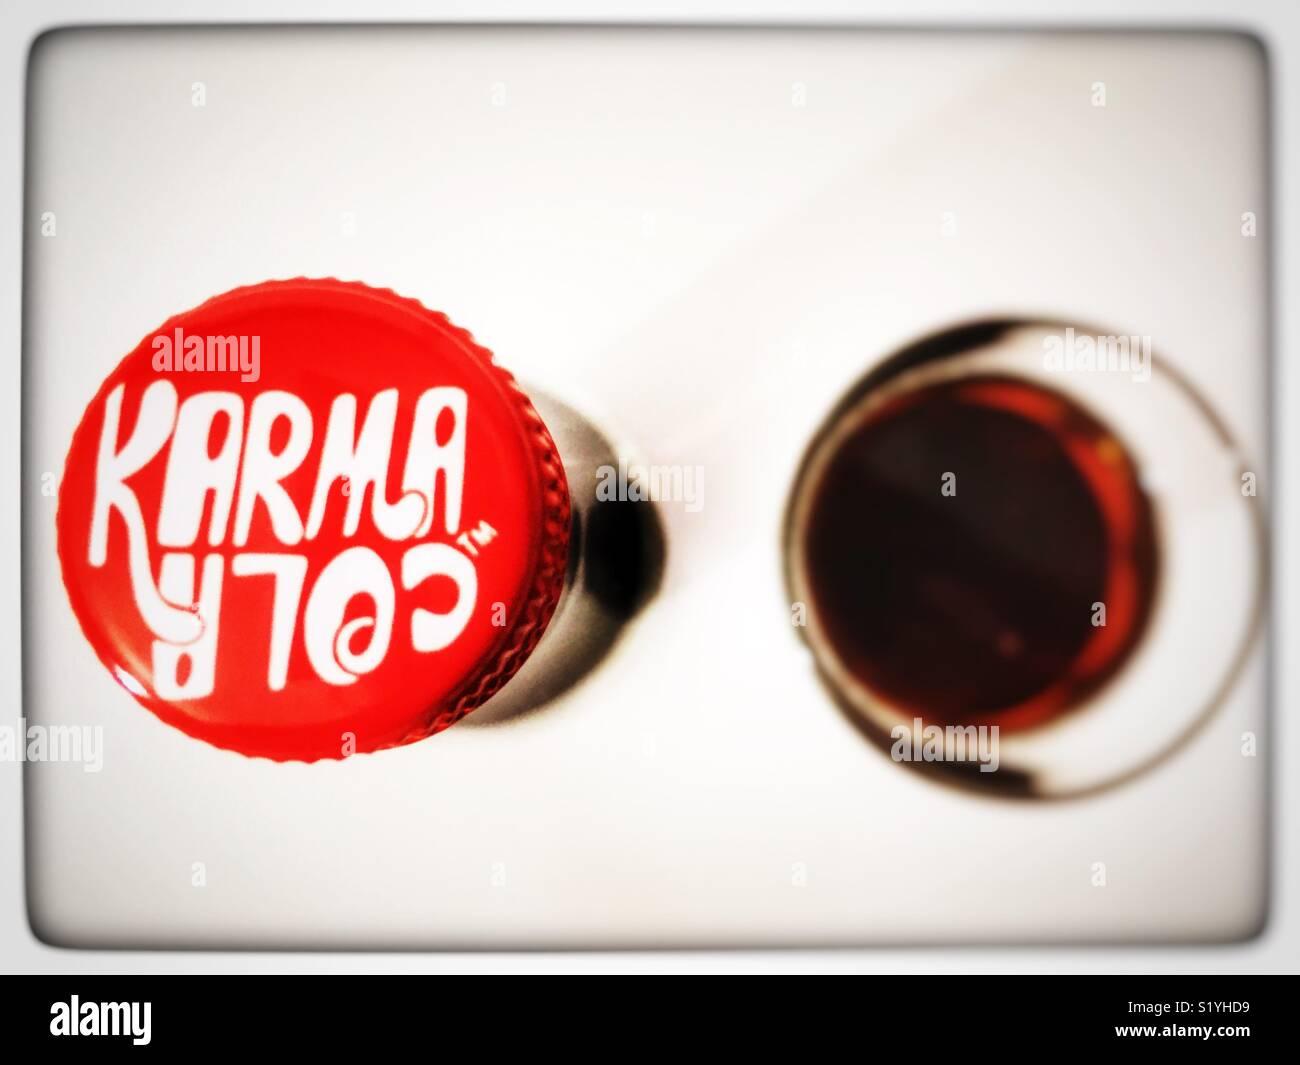 Karma Cola Imagen De Stock